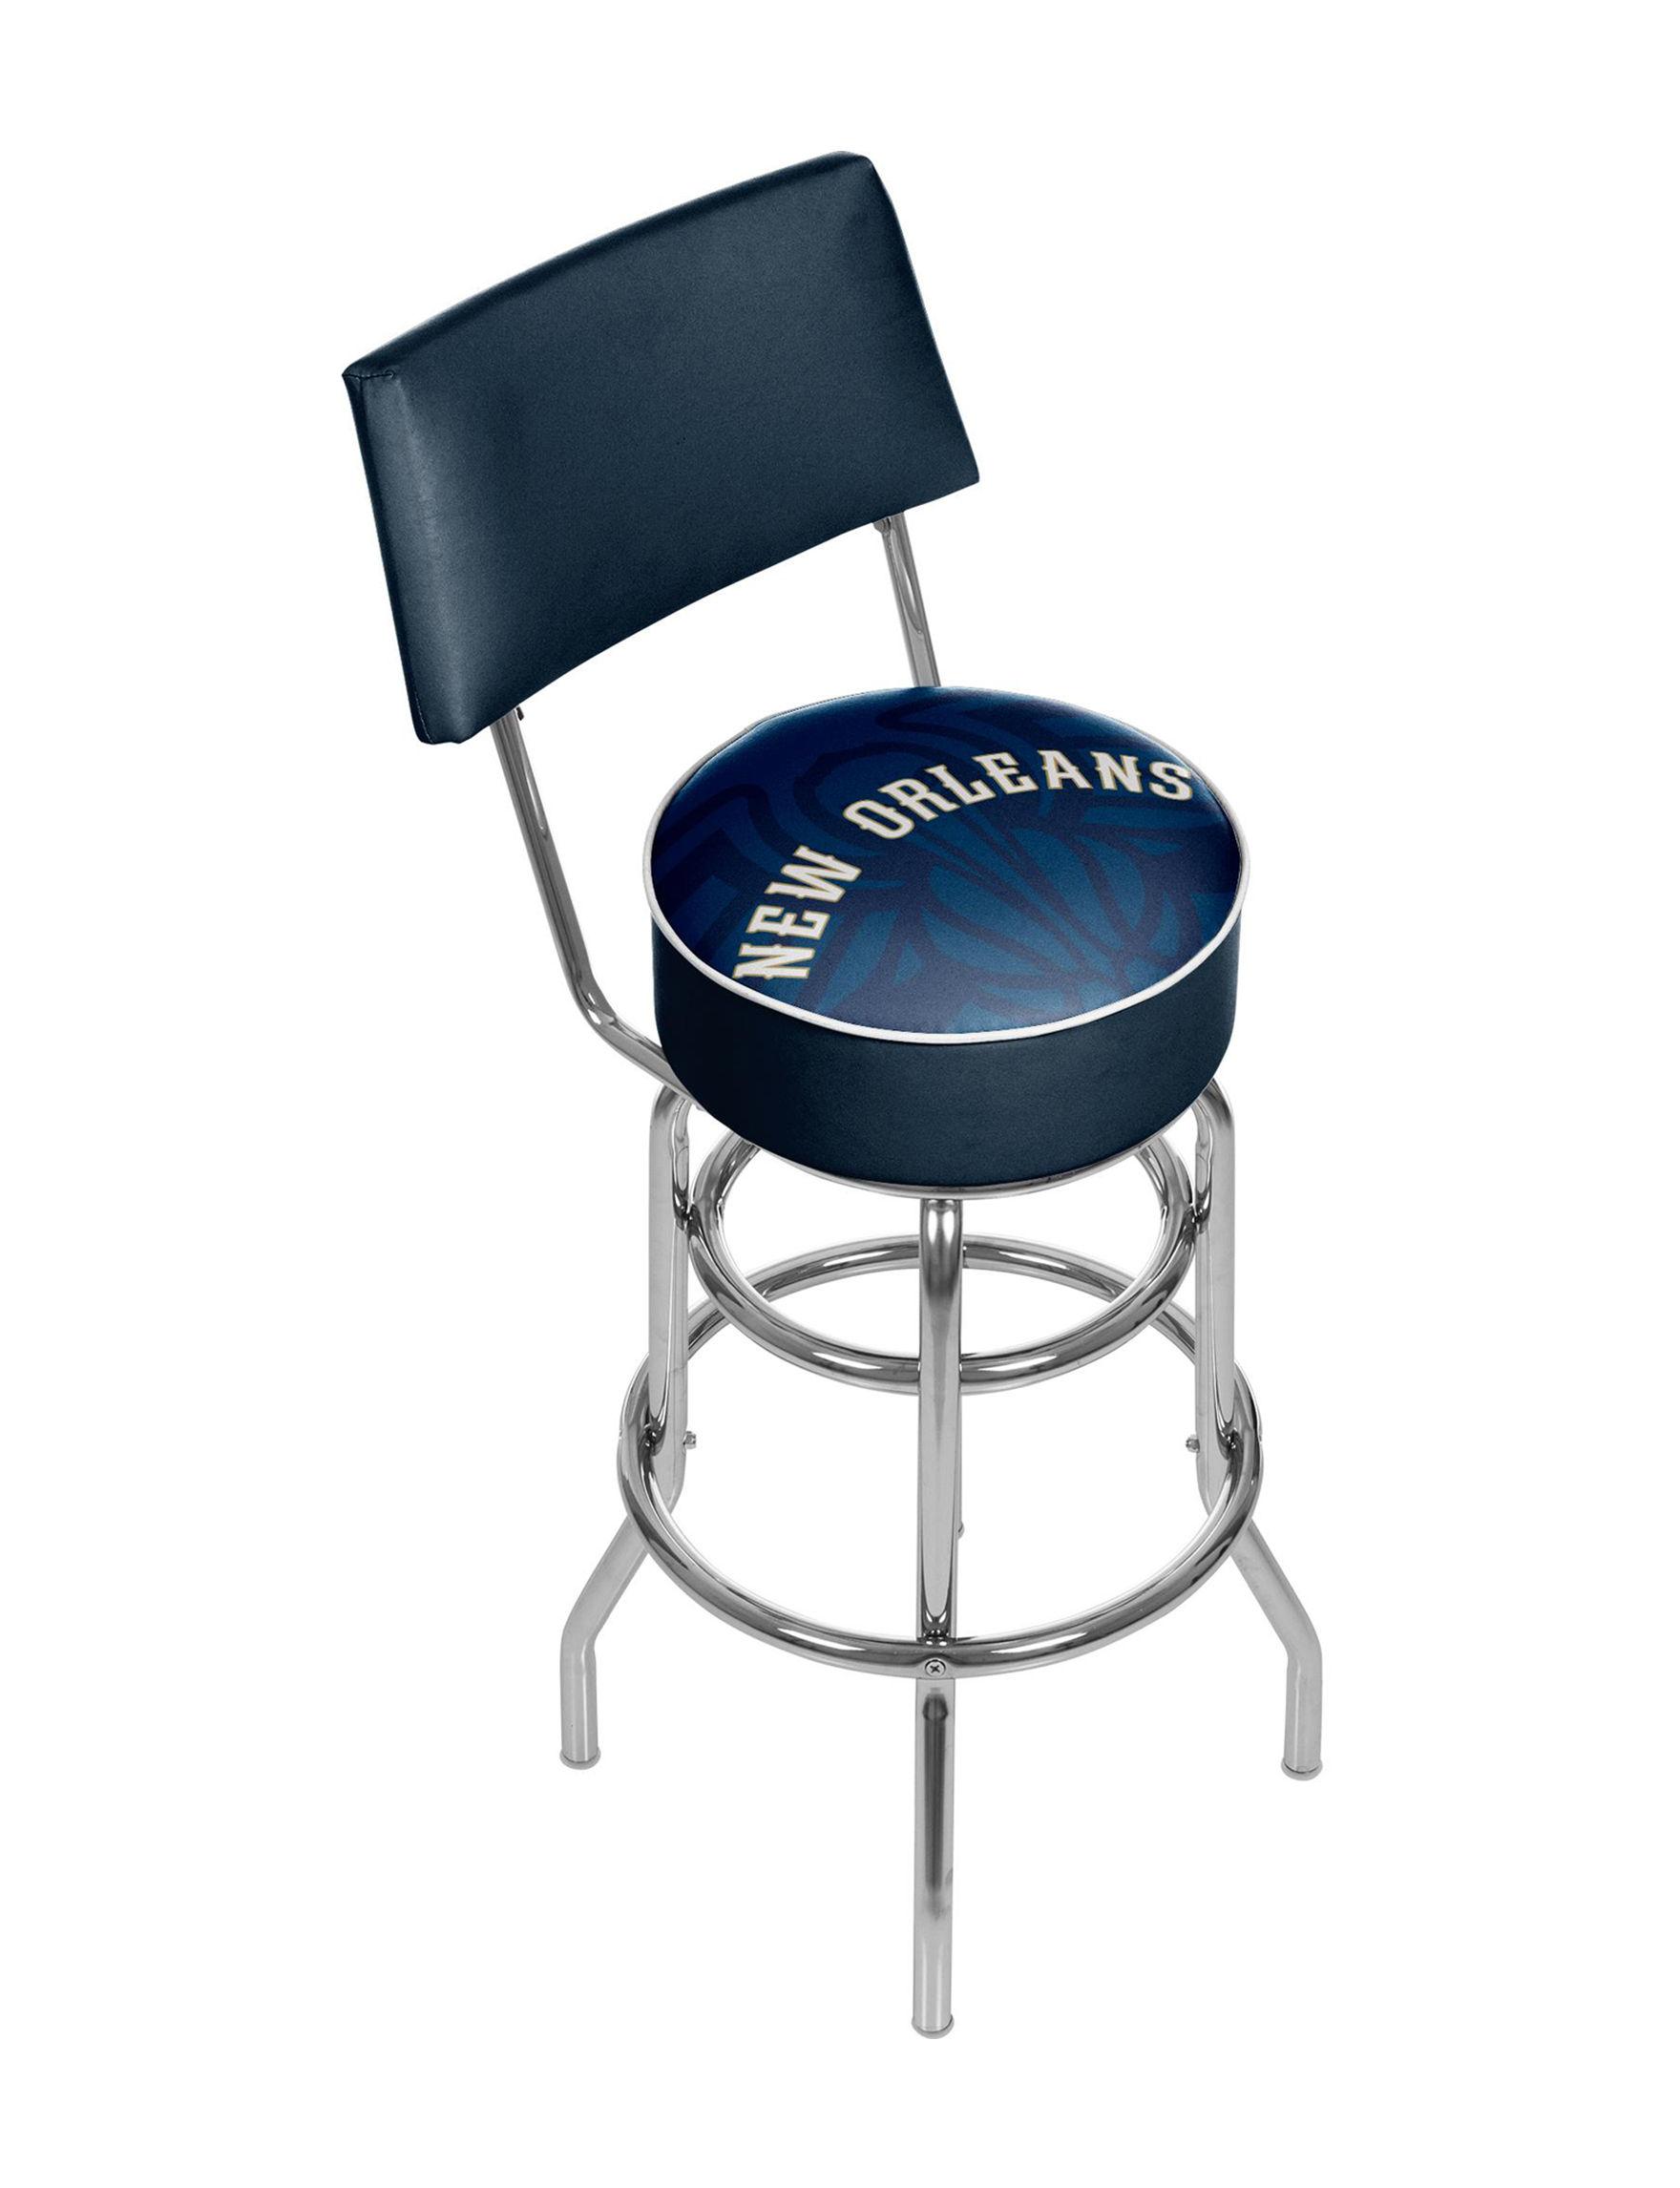 Trademark Global Navy / White Bar & Kitchen Stools Game Room Kitchen & Dining Furniture